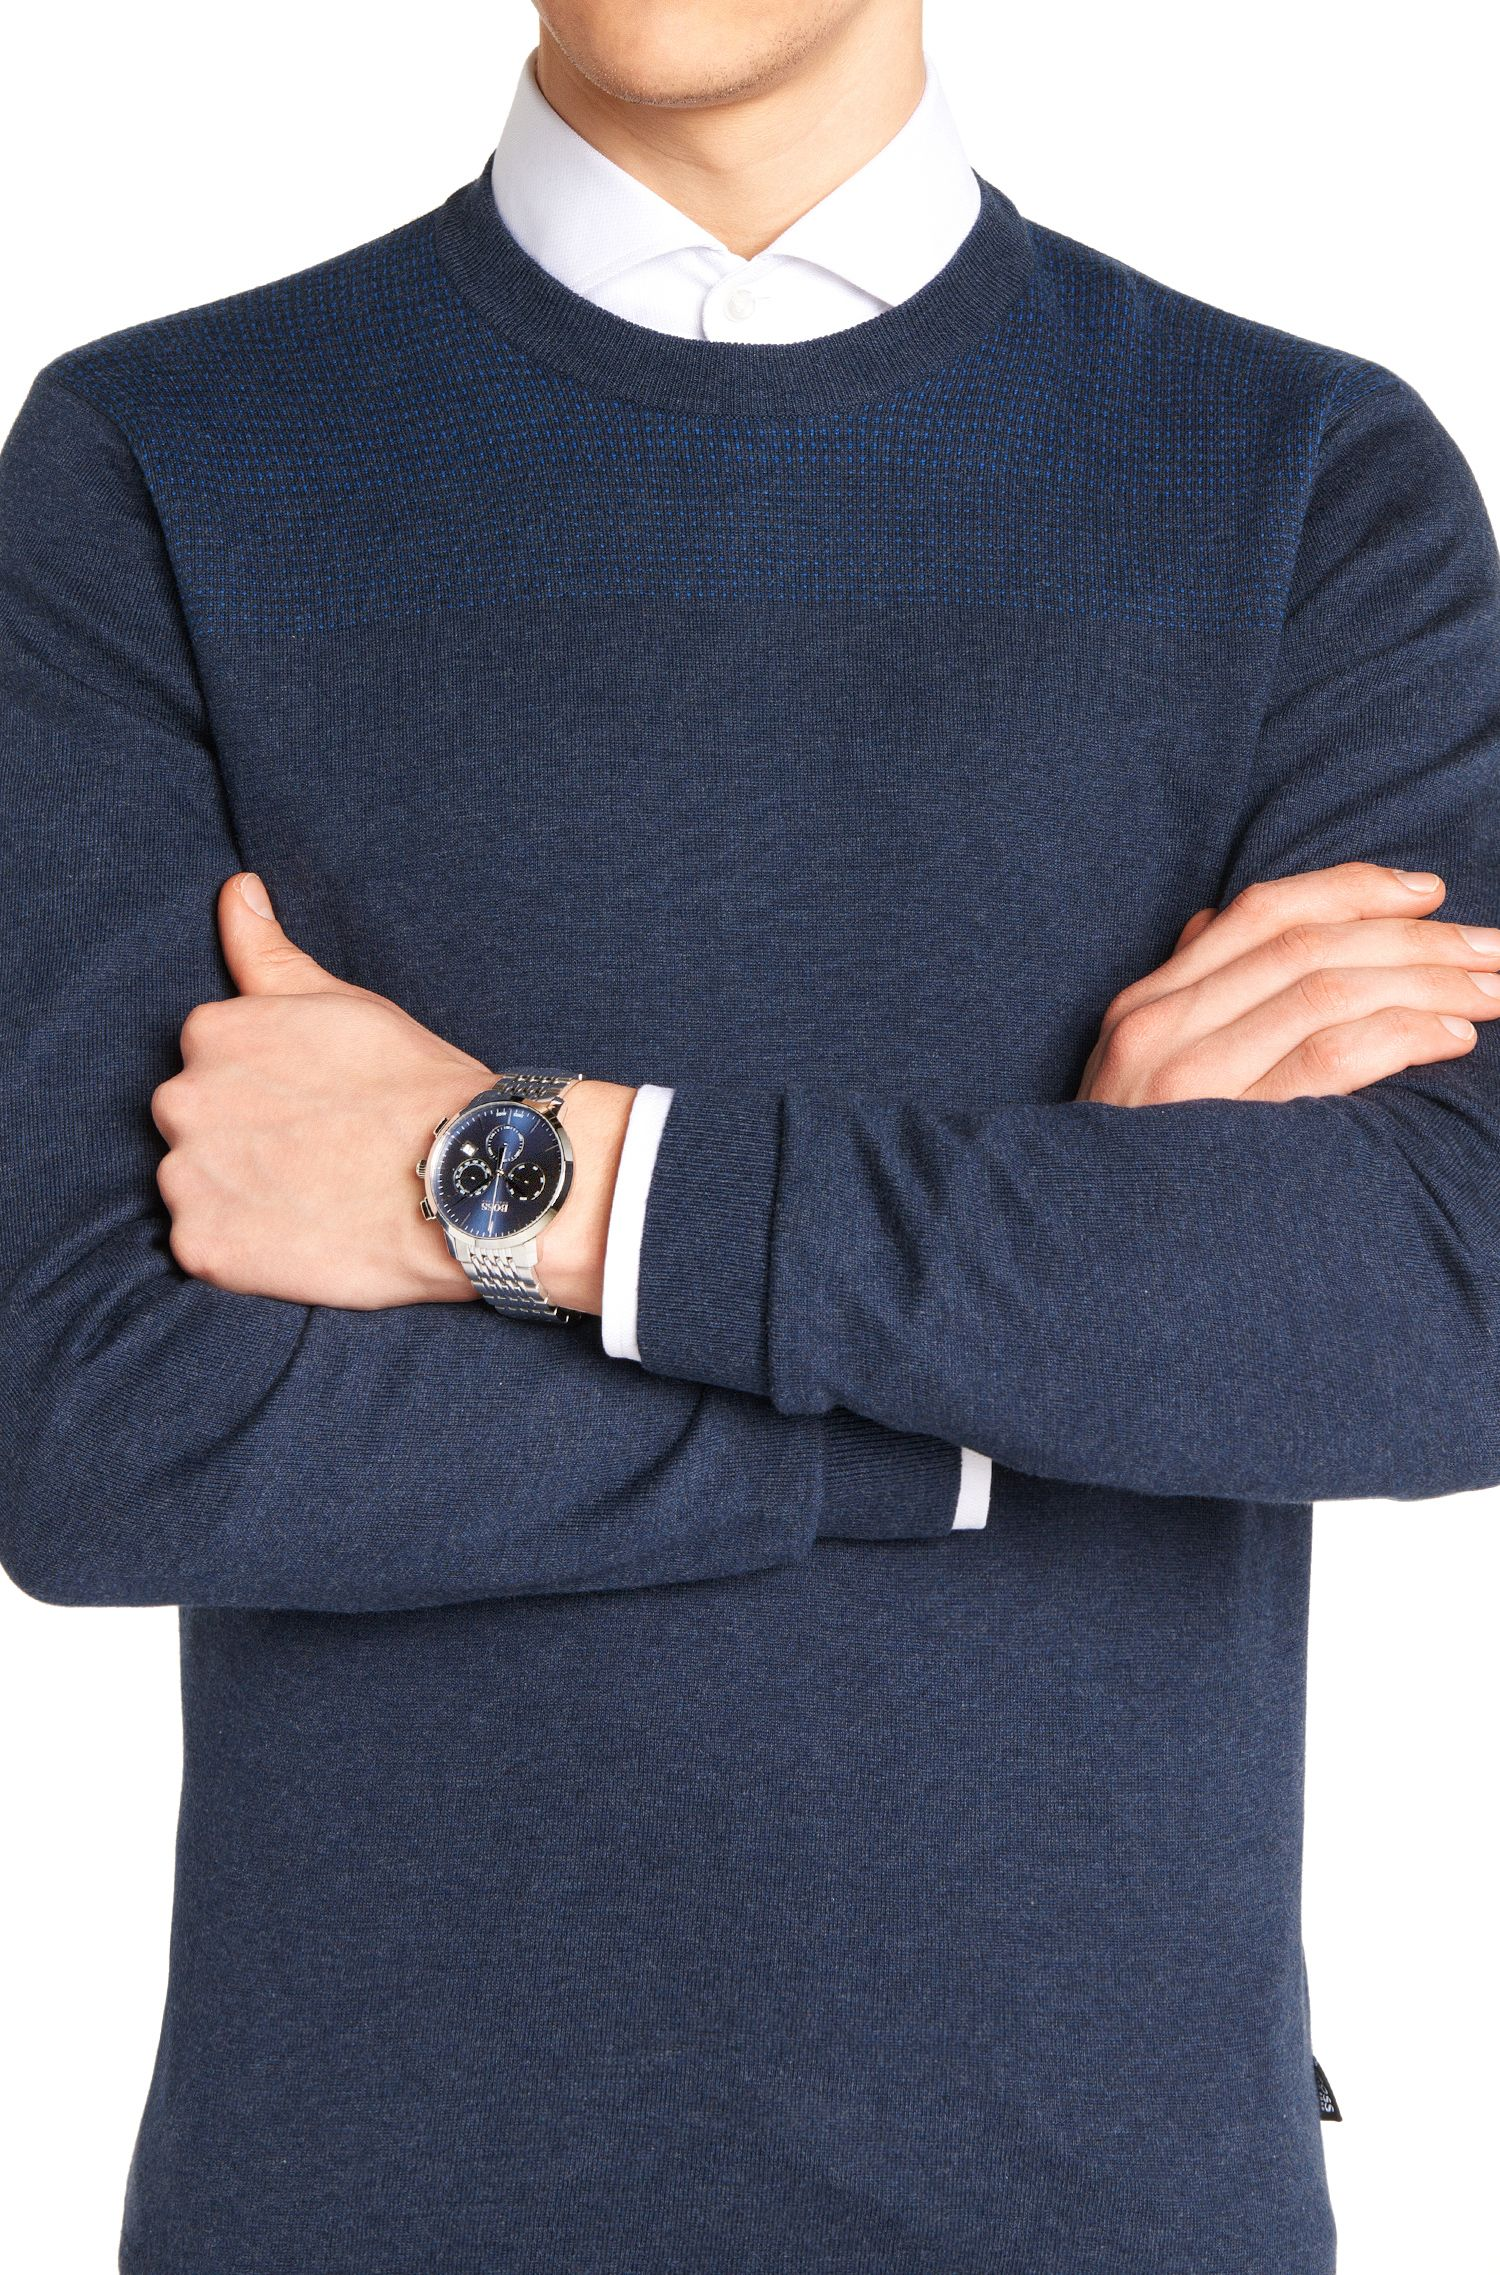 Chronograph aus Edelstahl mit Gliederarmband: 'Signature Timepiece'